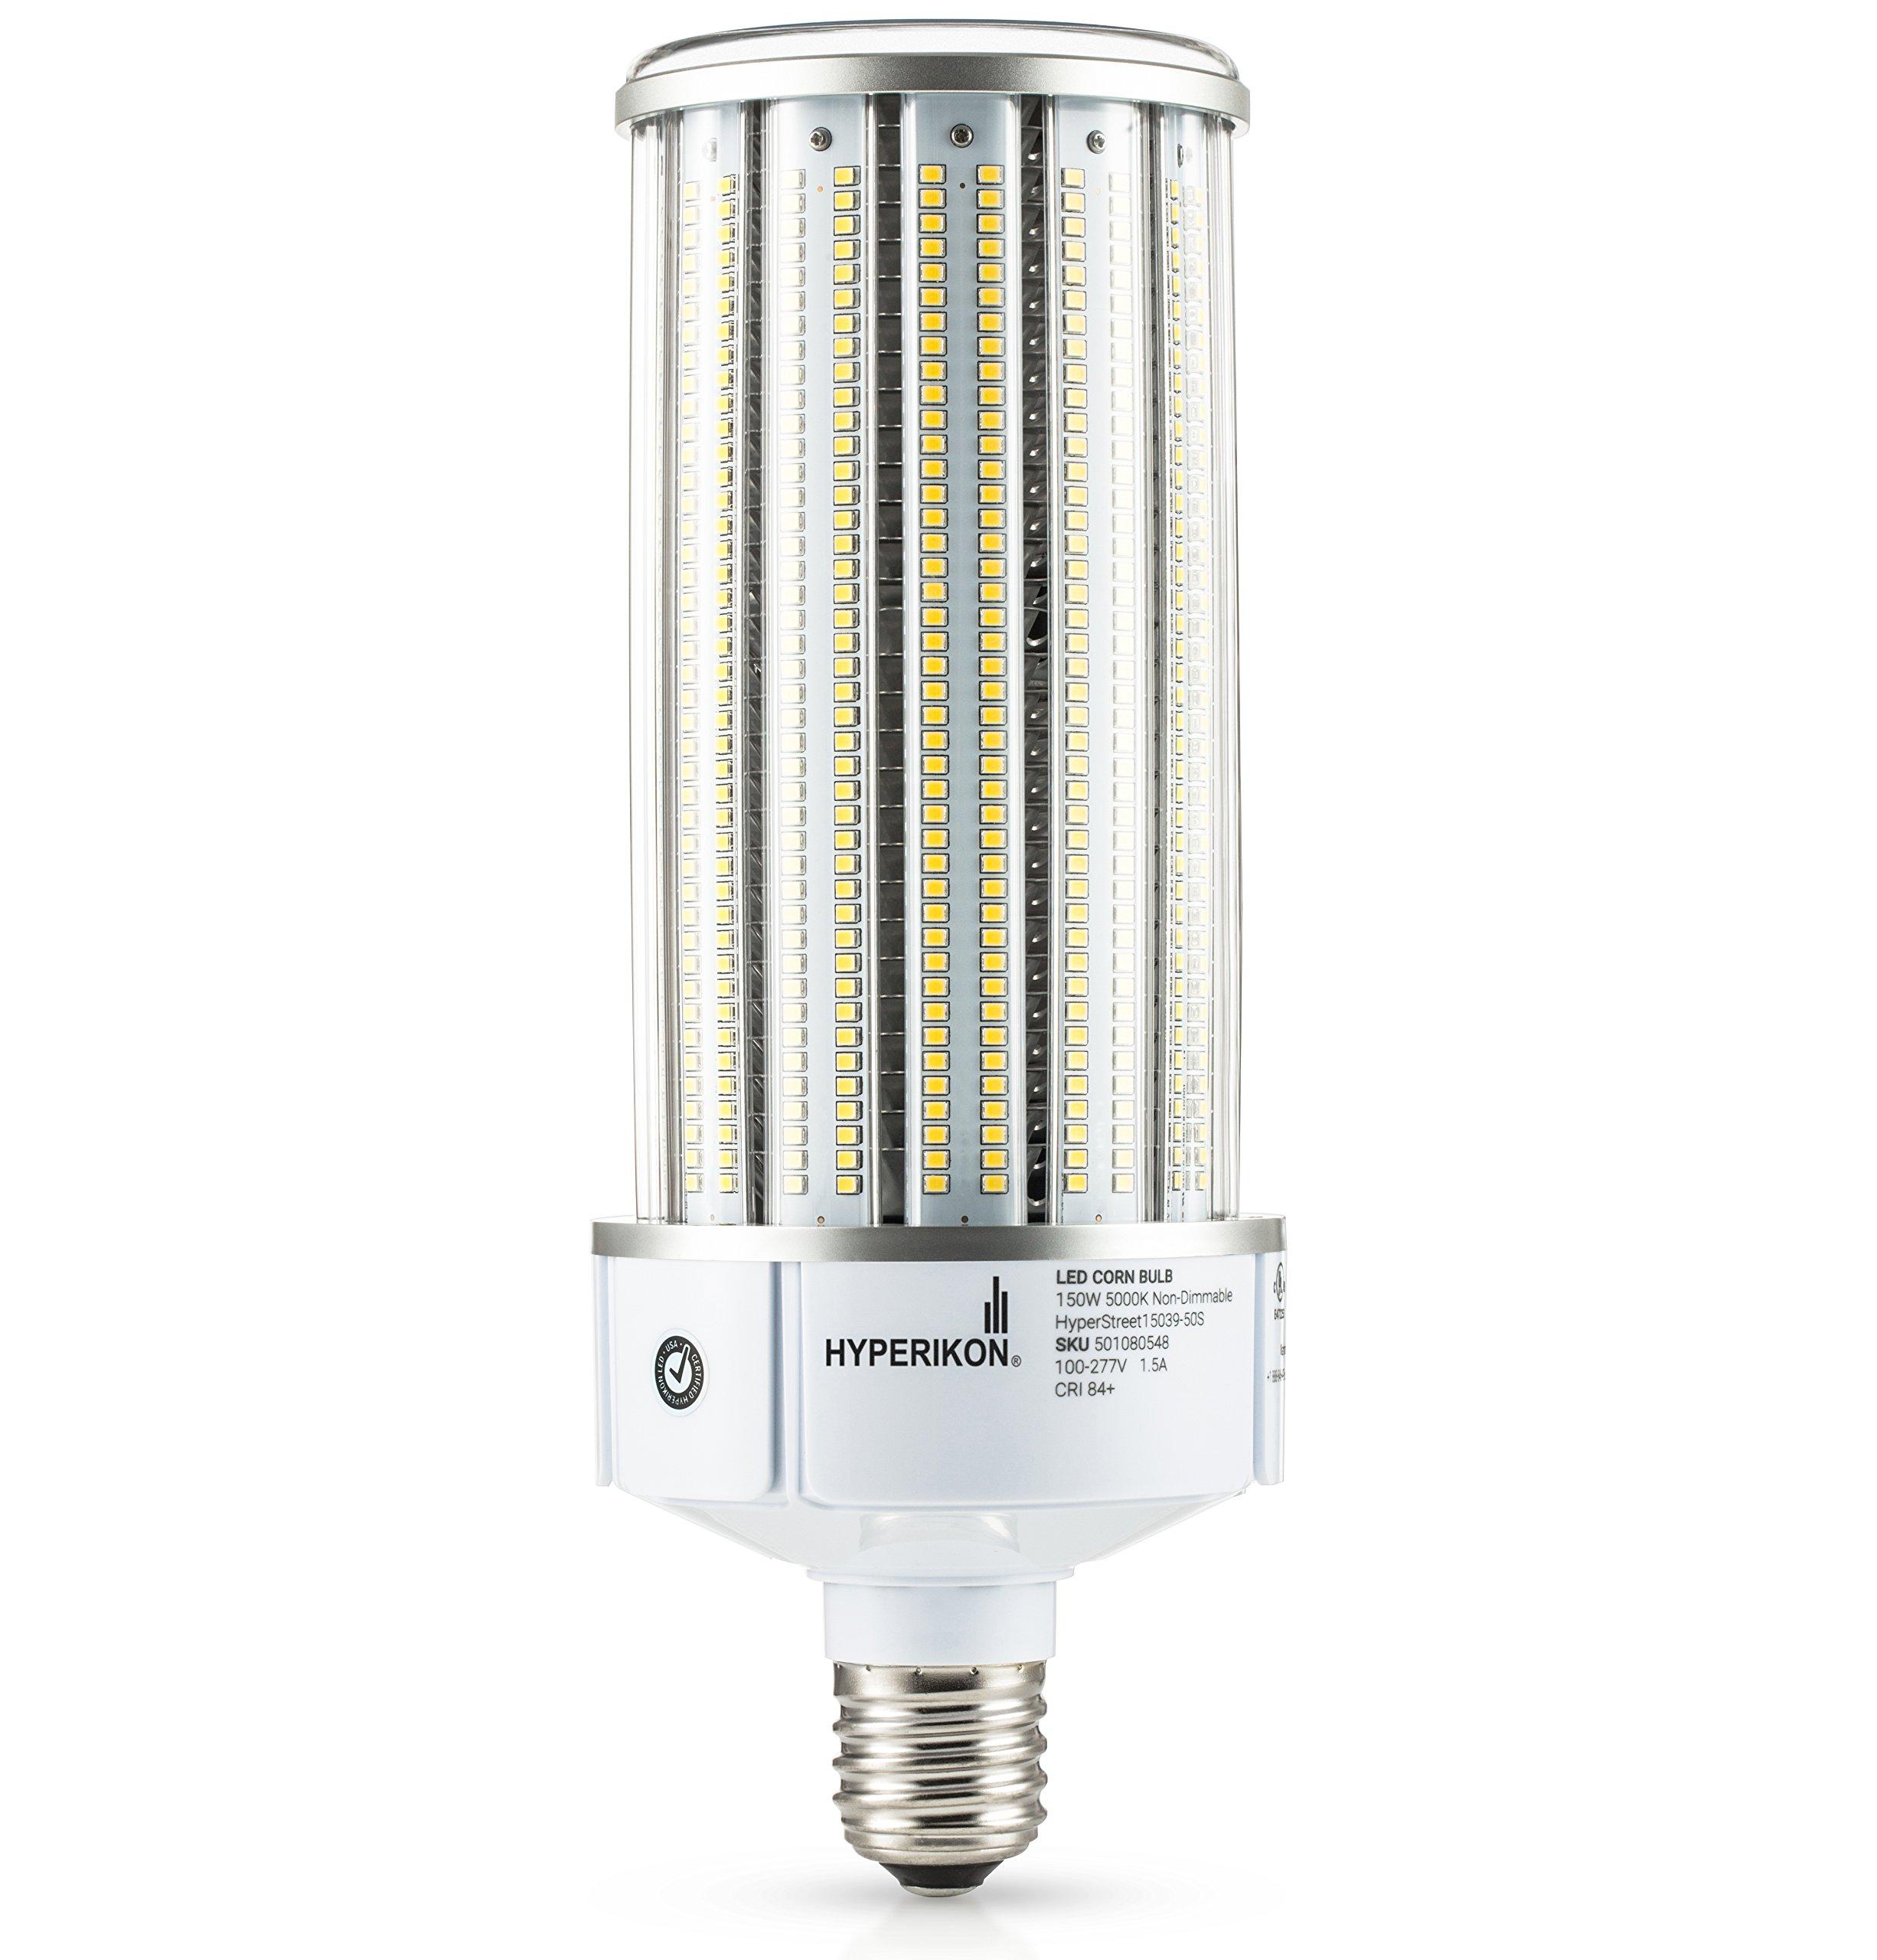 Hyperikon LED Corn Bulb Street Light 150W (HIP/HID Replacement) 19500 Lumen, Large Mogul E39 Base, 5000K Outdoor Indoor Area Lighting, IP64 Waterproof, UL